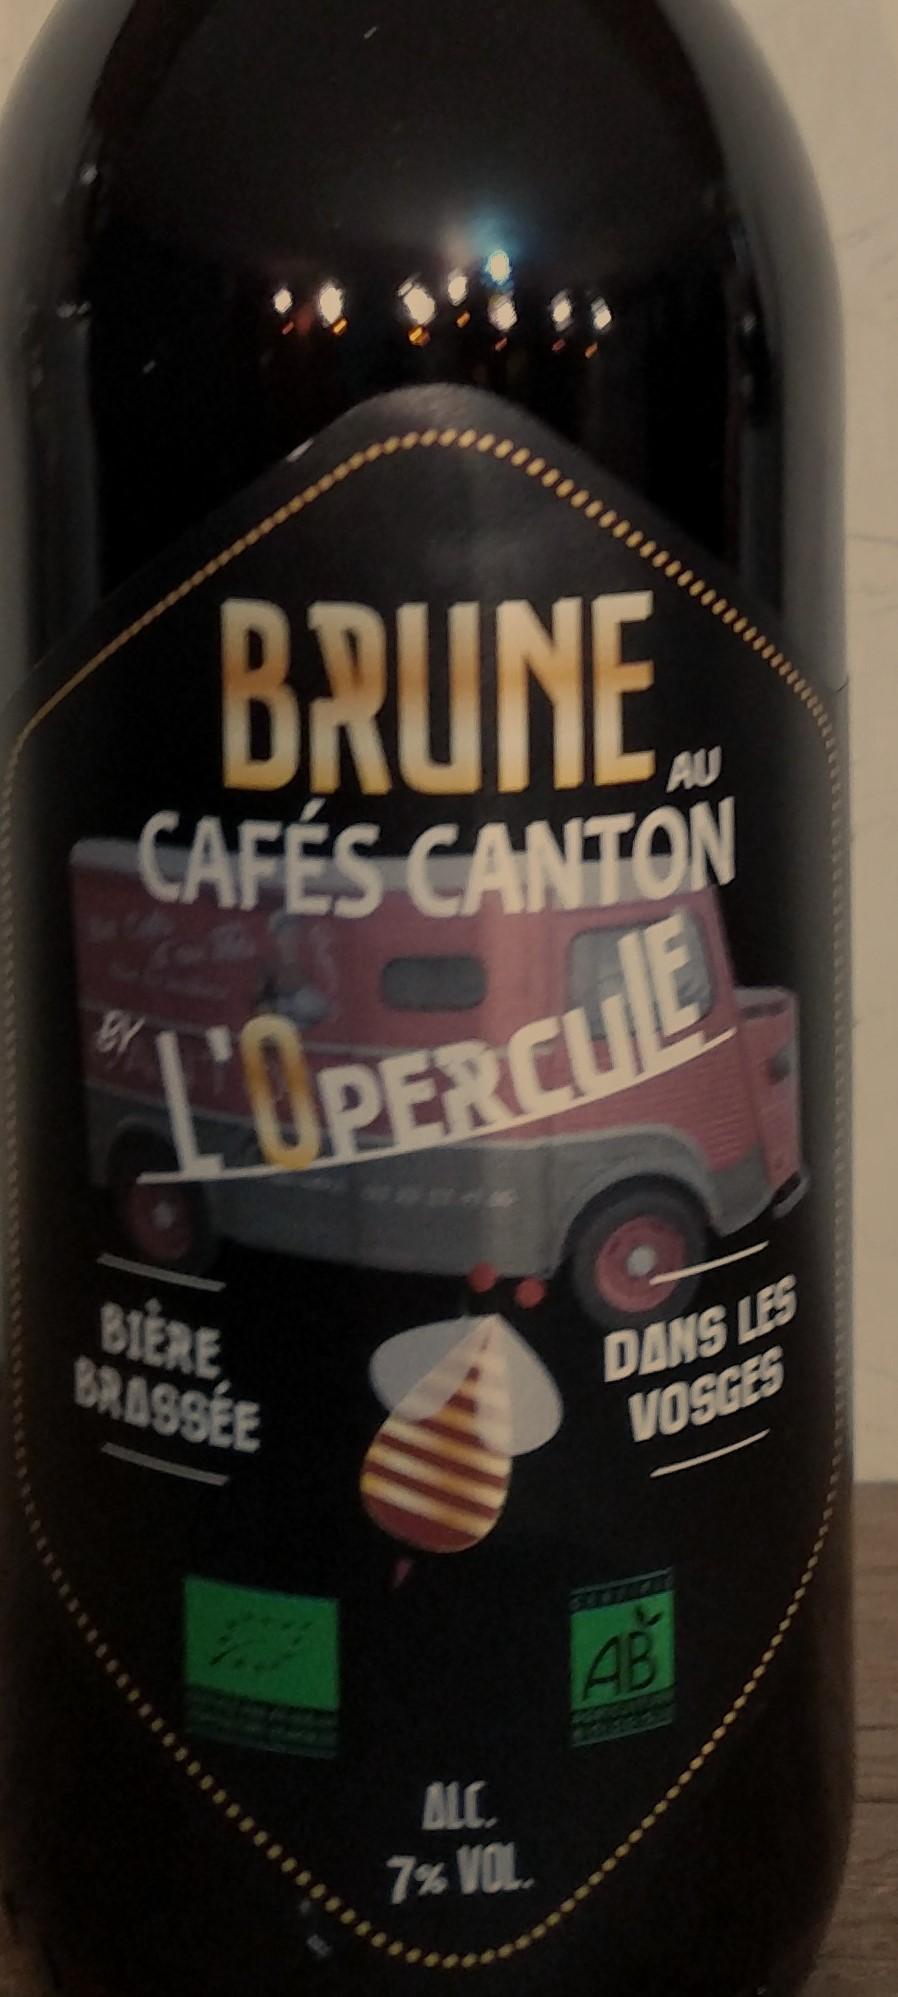 Brune au cafe canton